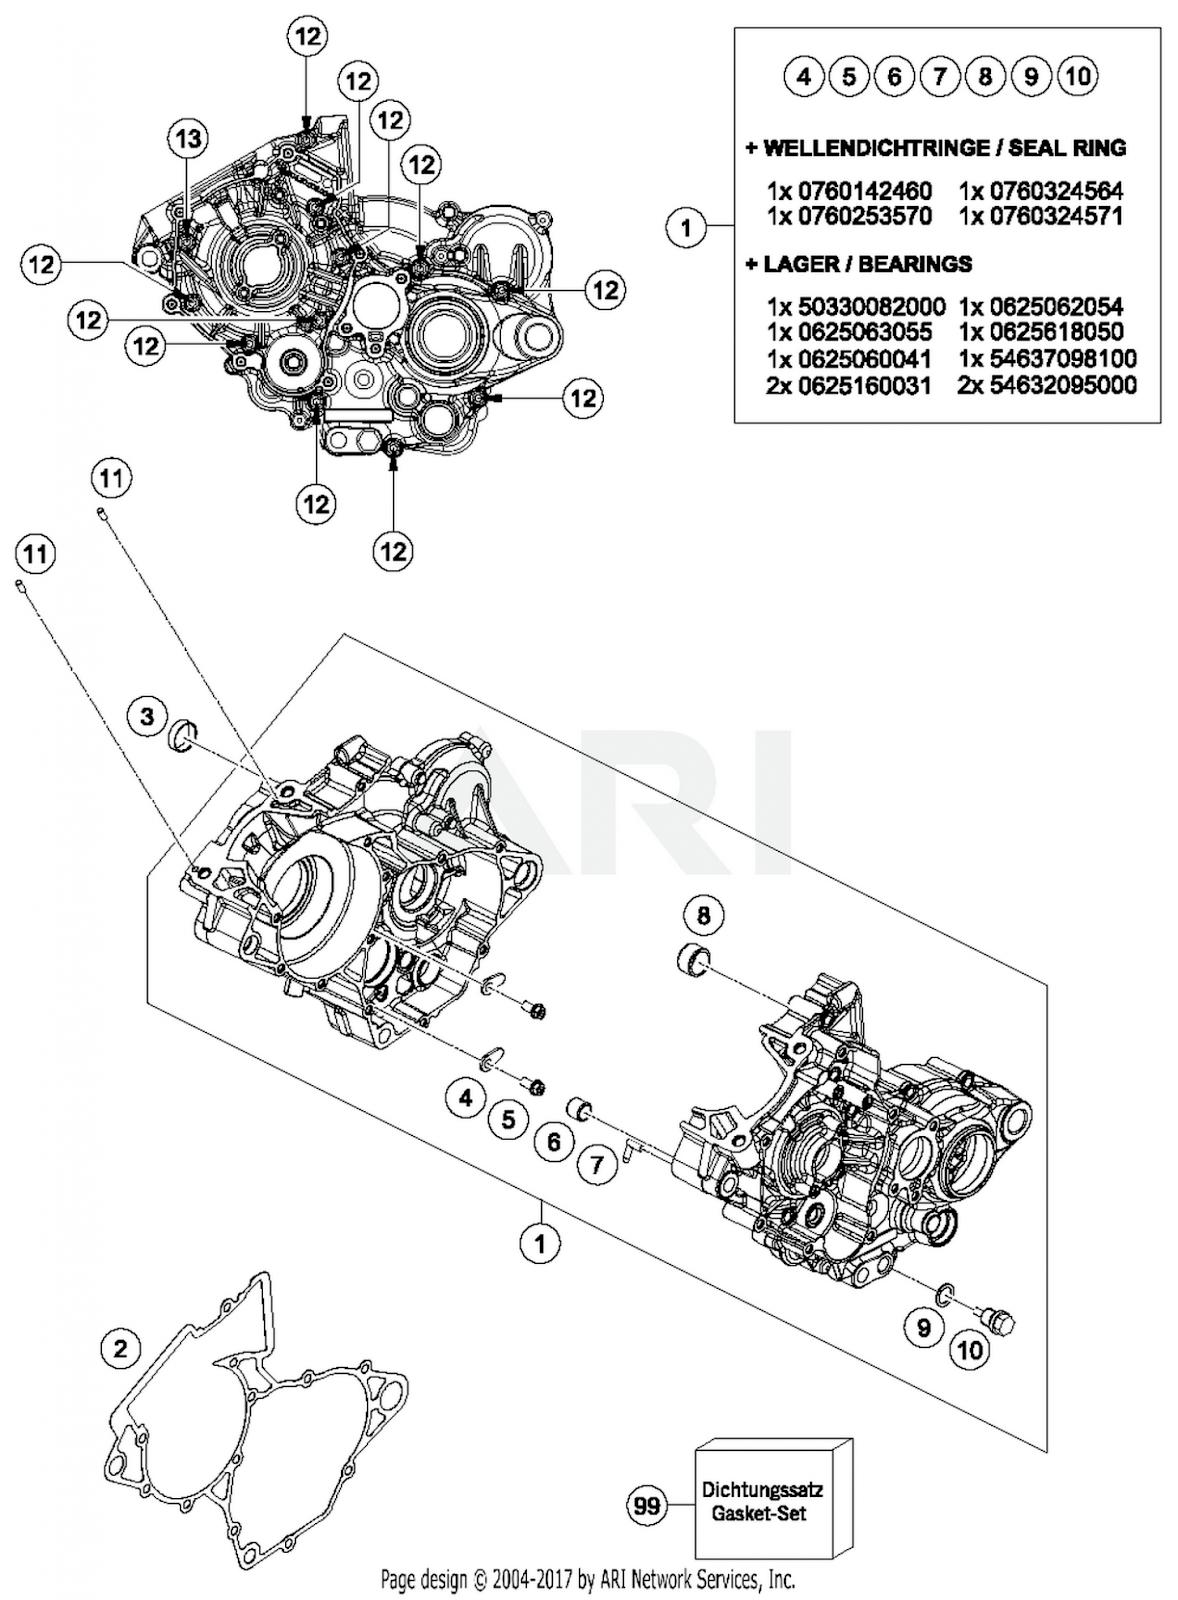 Lt6 Engine Diagram Wiring In